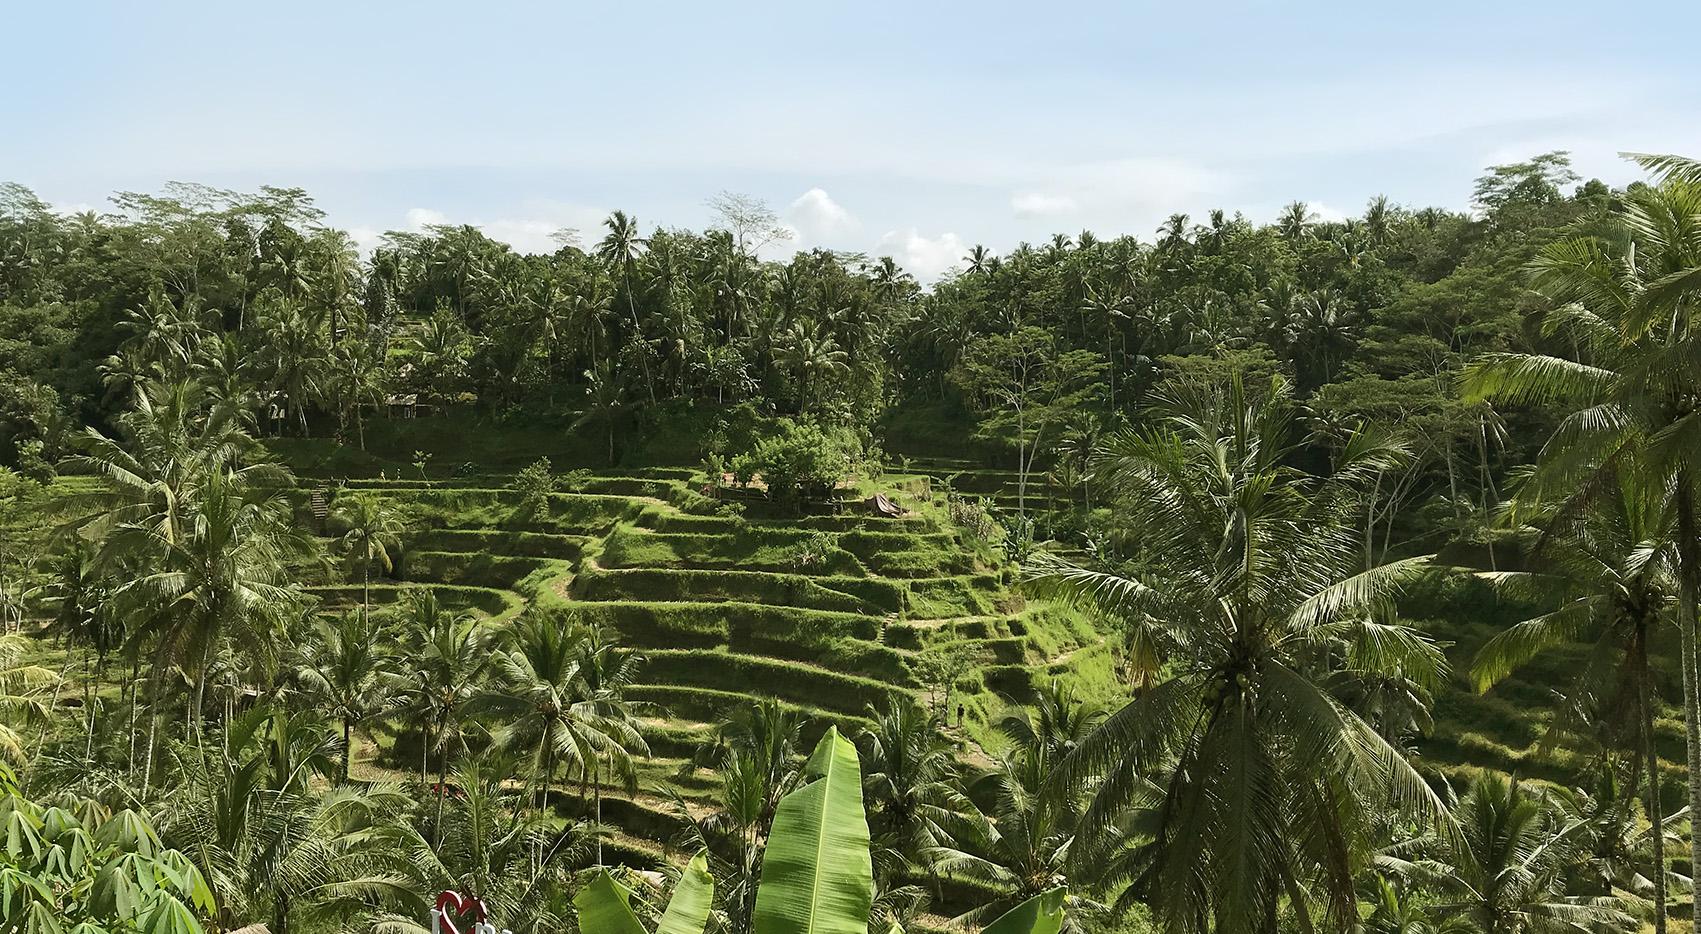 bali-rice-fields.jpg